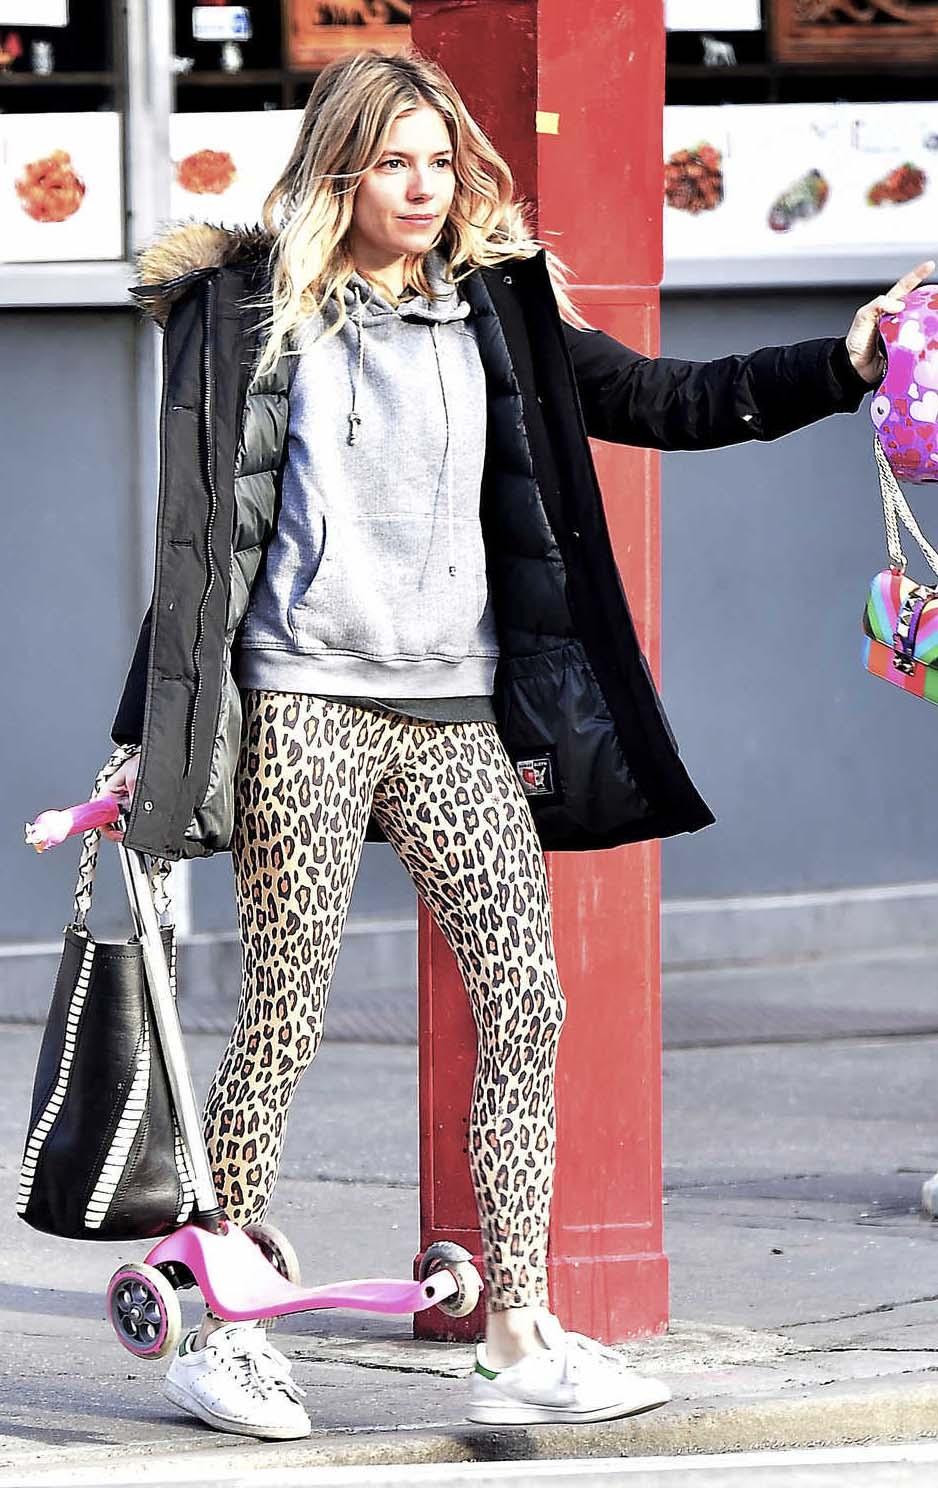 tan-leggings-leopard-grayl-sweater-sweatshirt-black-jacket-coat-parka-white-shoe-sneakers-siennamiller-fall-blonde-weekend.jpg